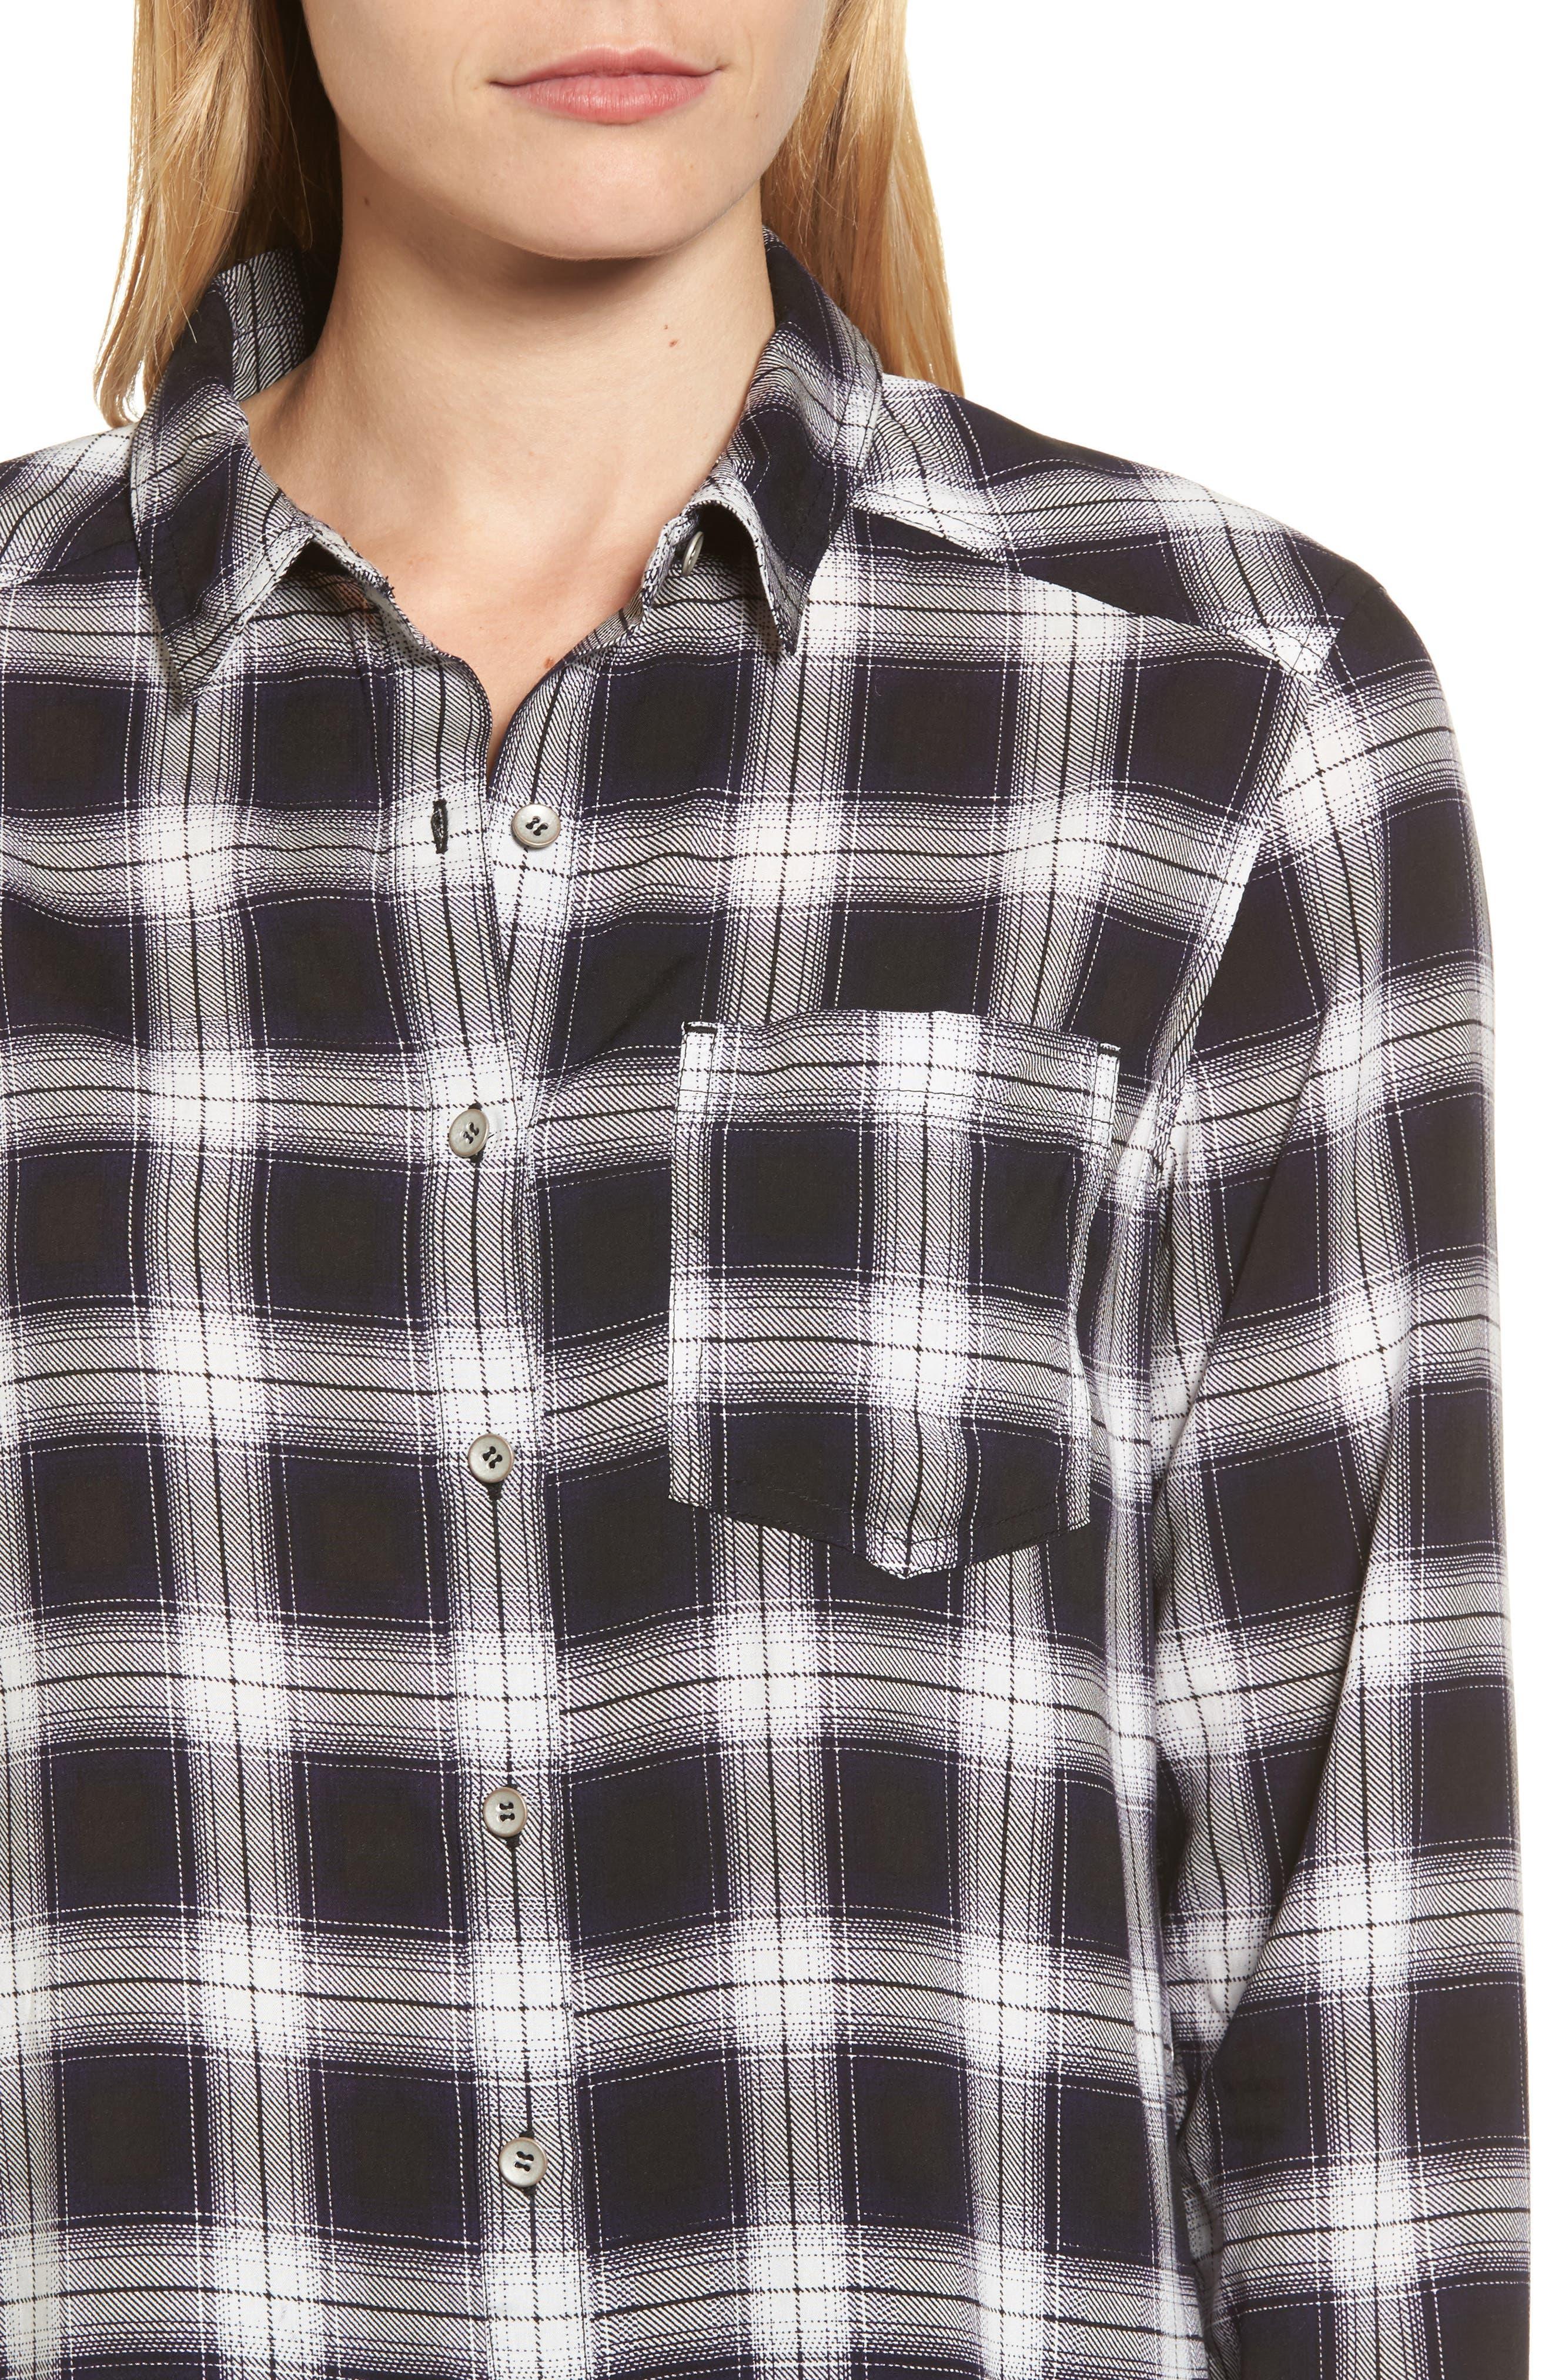 Plaid Shirt,                             Alternate thumbnail 4, color,                             Black- White Plaid